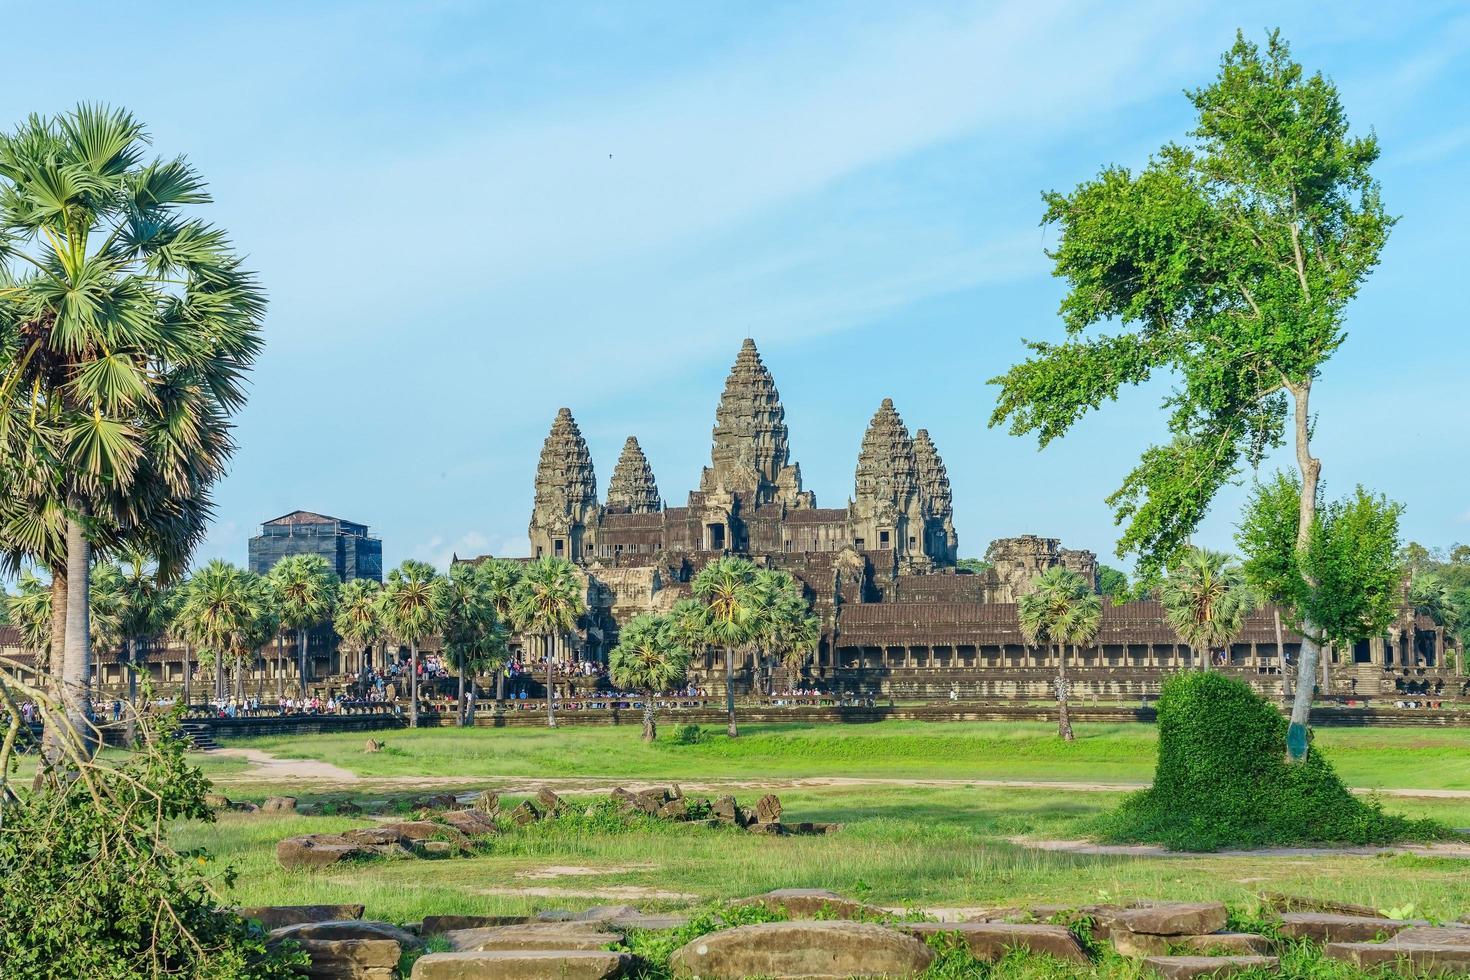 antico tempio di angkor wat, siem reap, cambogia foto